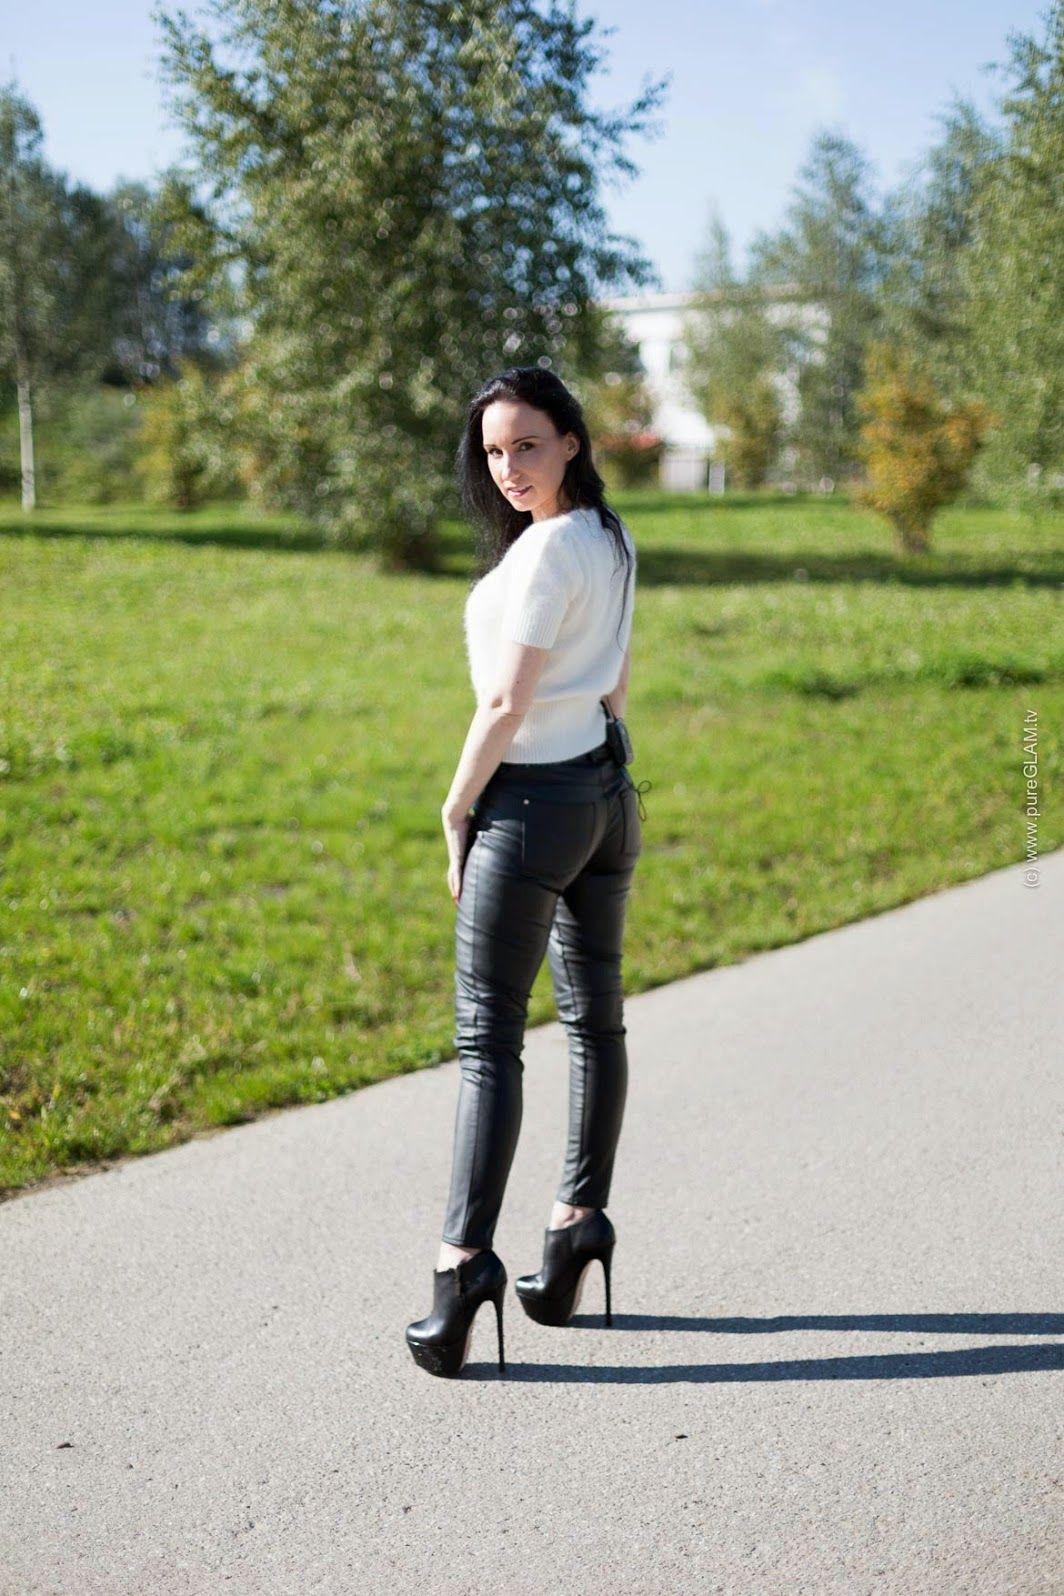 248b05f4da598 Pin by Jim Mundahl on leather | Walking in high heels, Extreme high ...